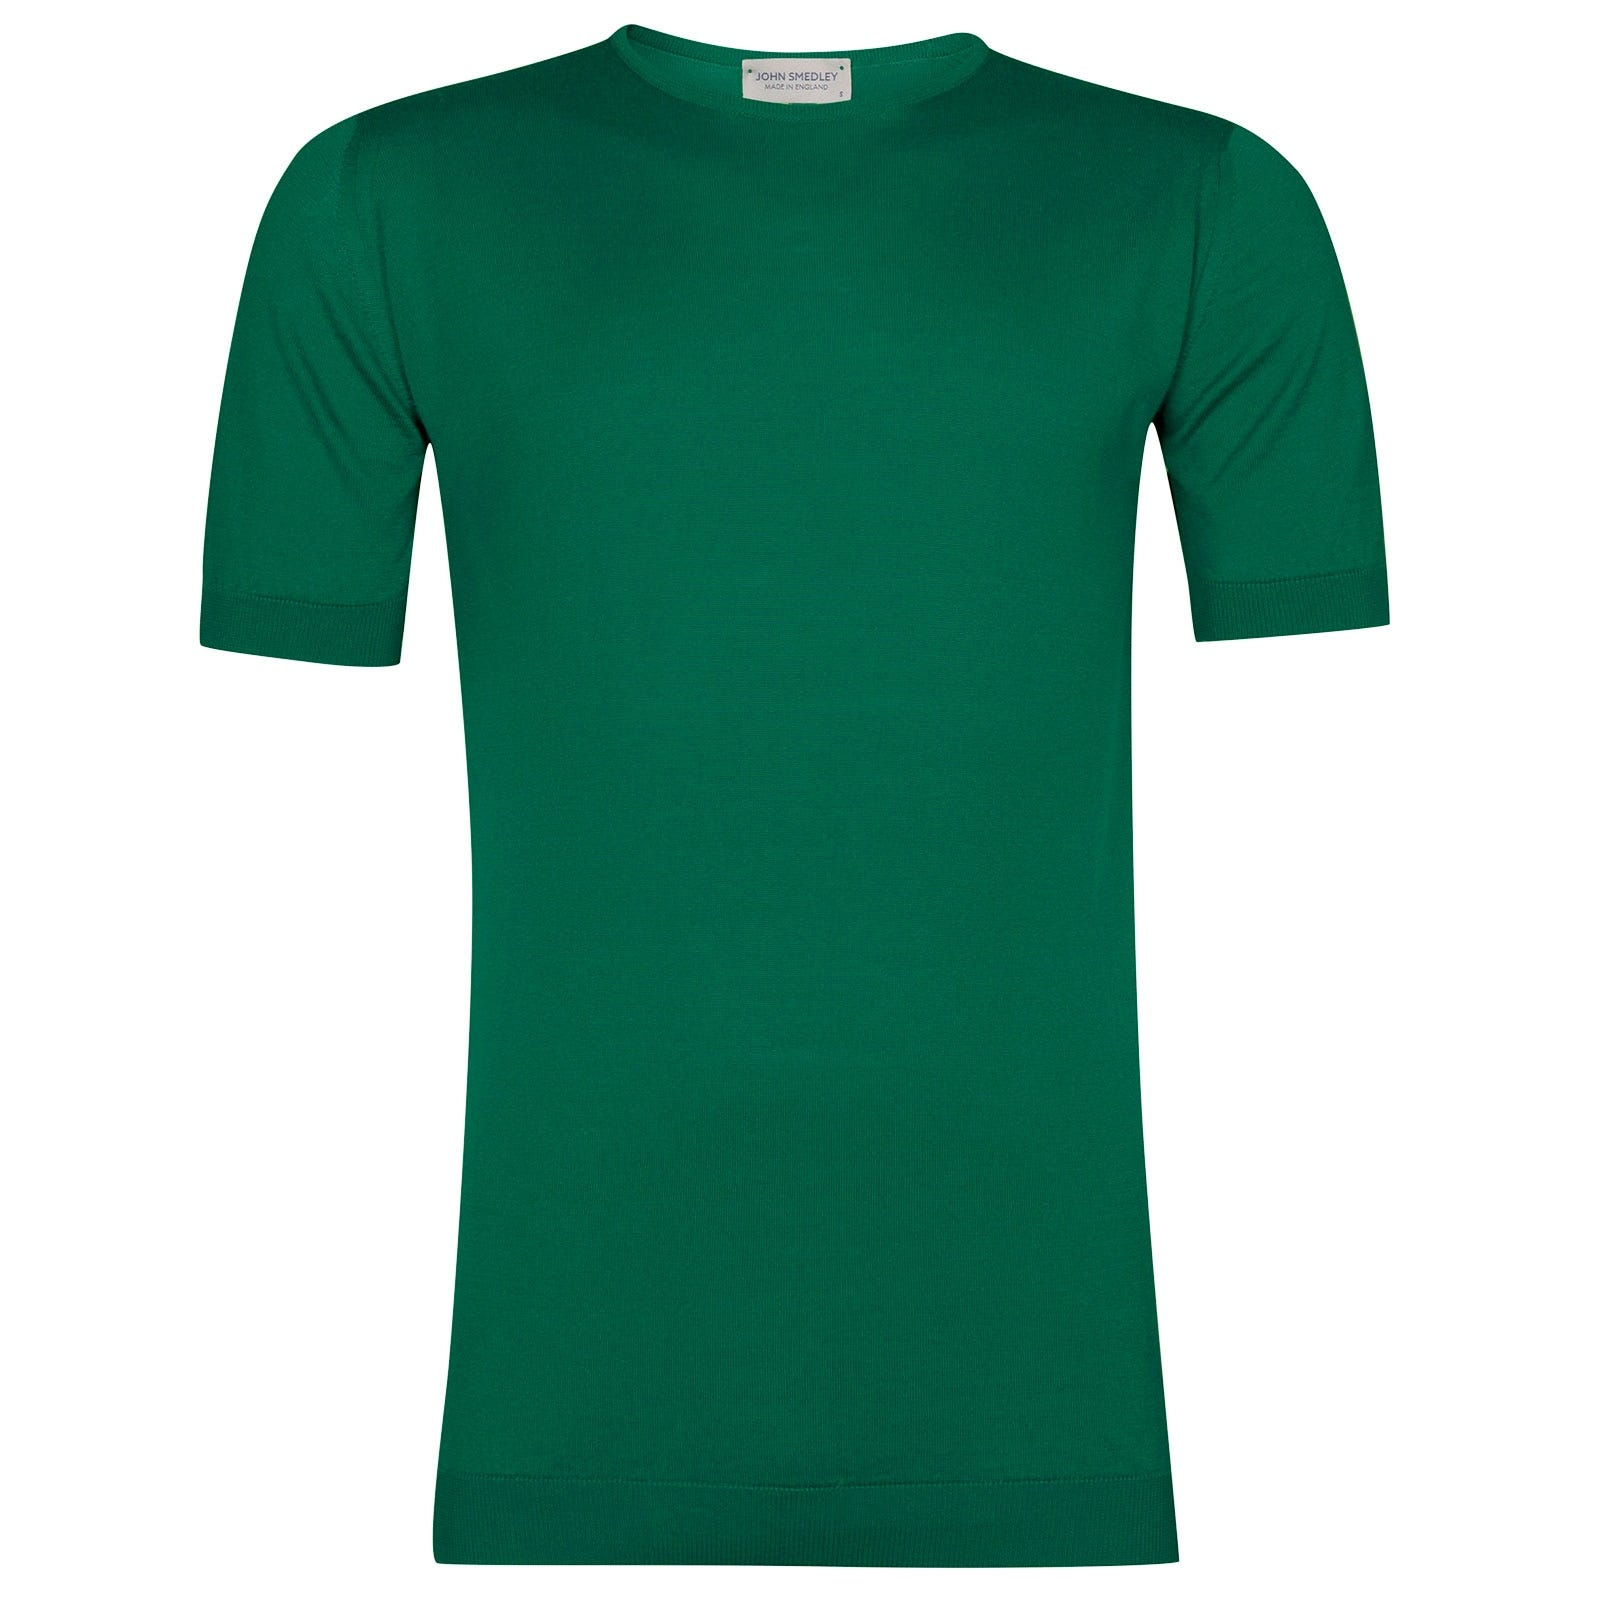 John Smedley Belden Sea Island Cotton T-shirt in Boron Green-XL